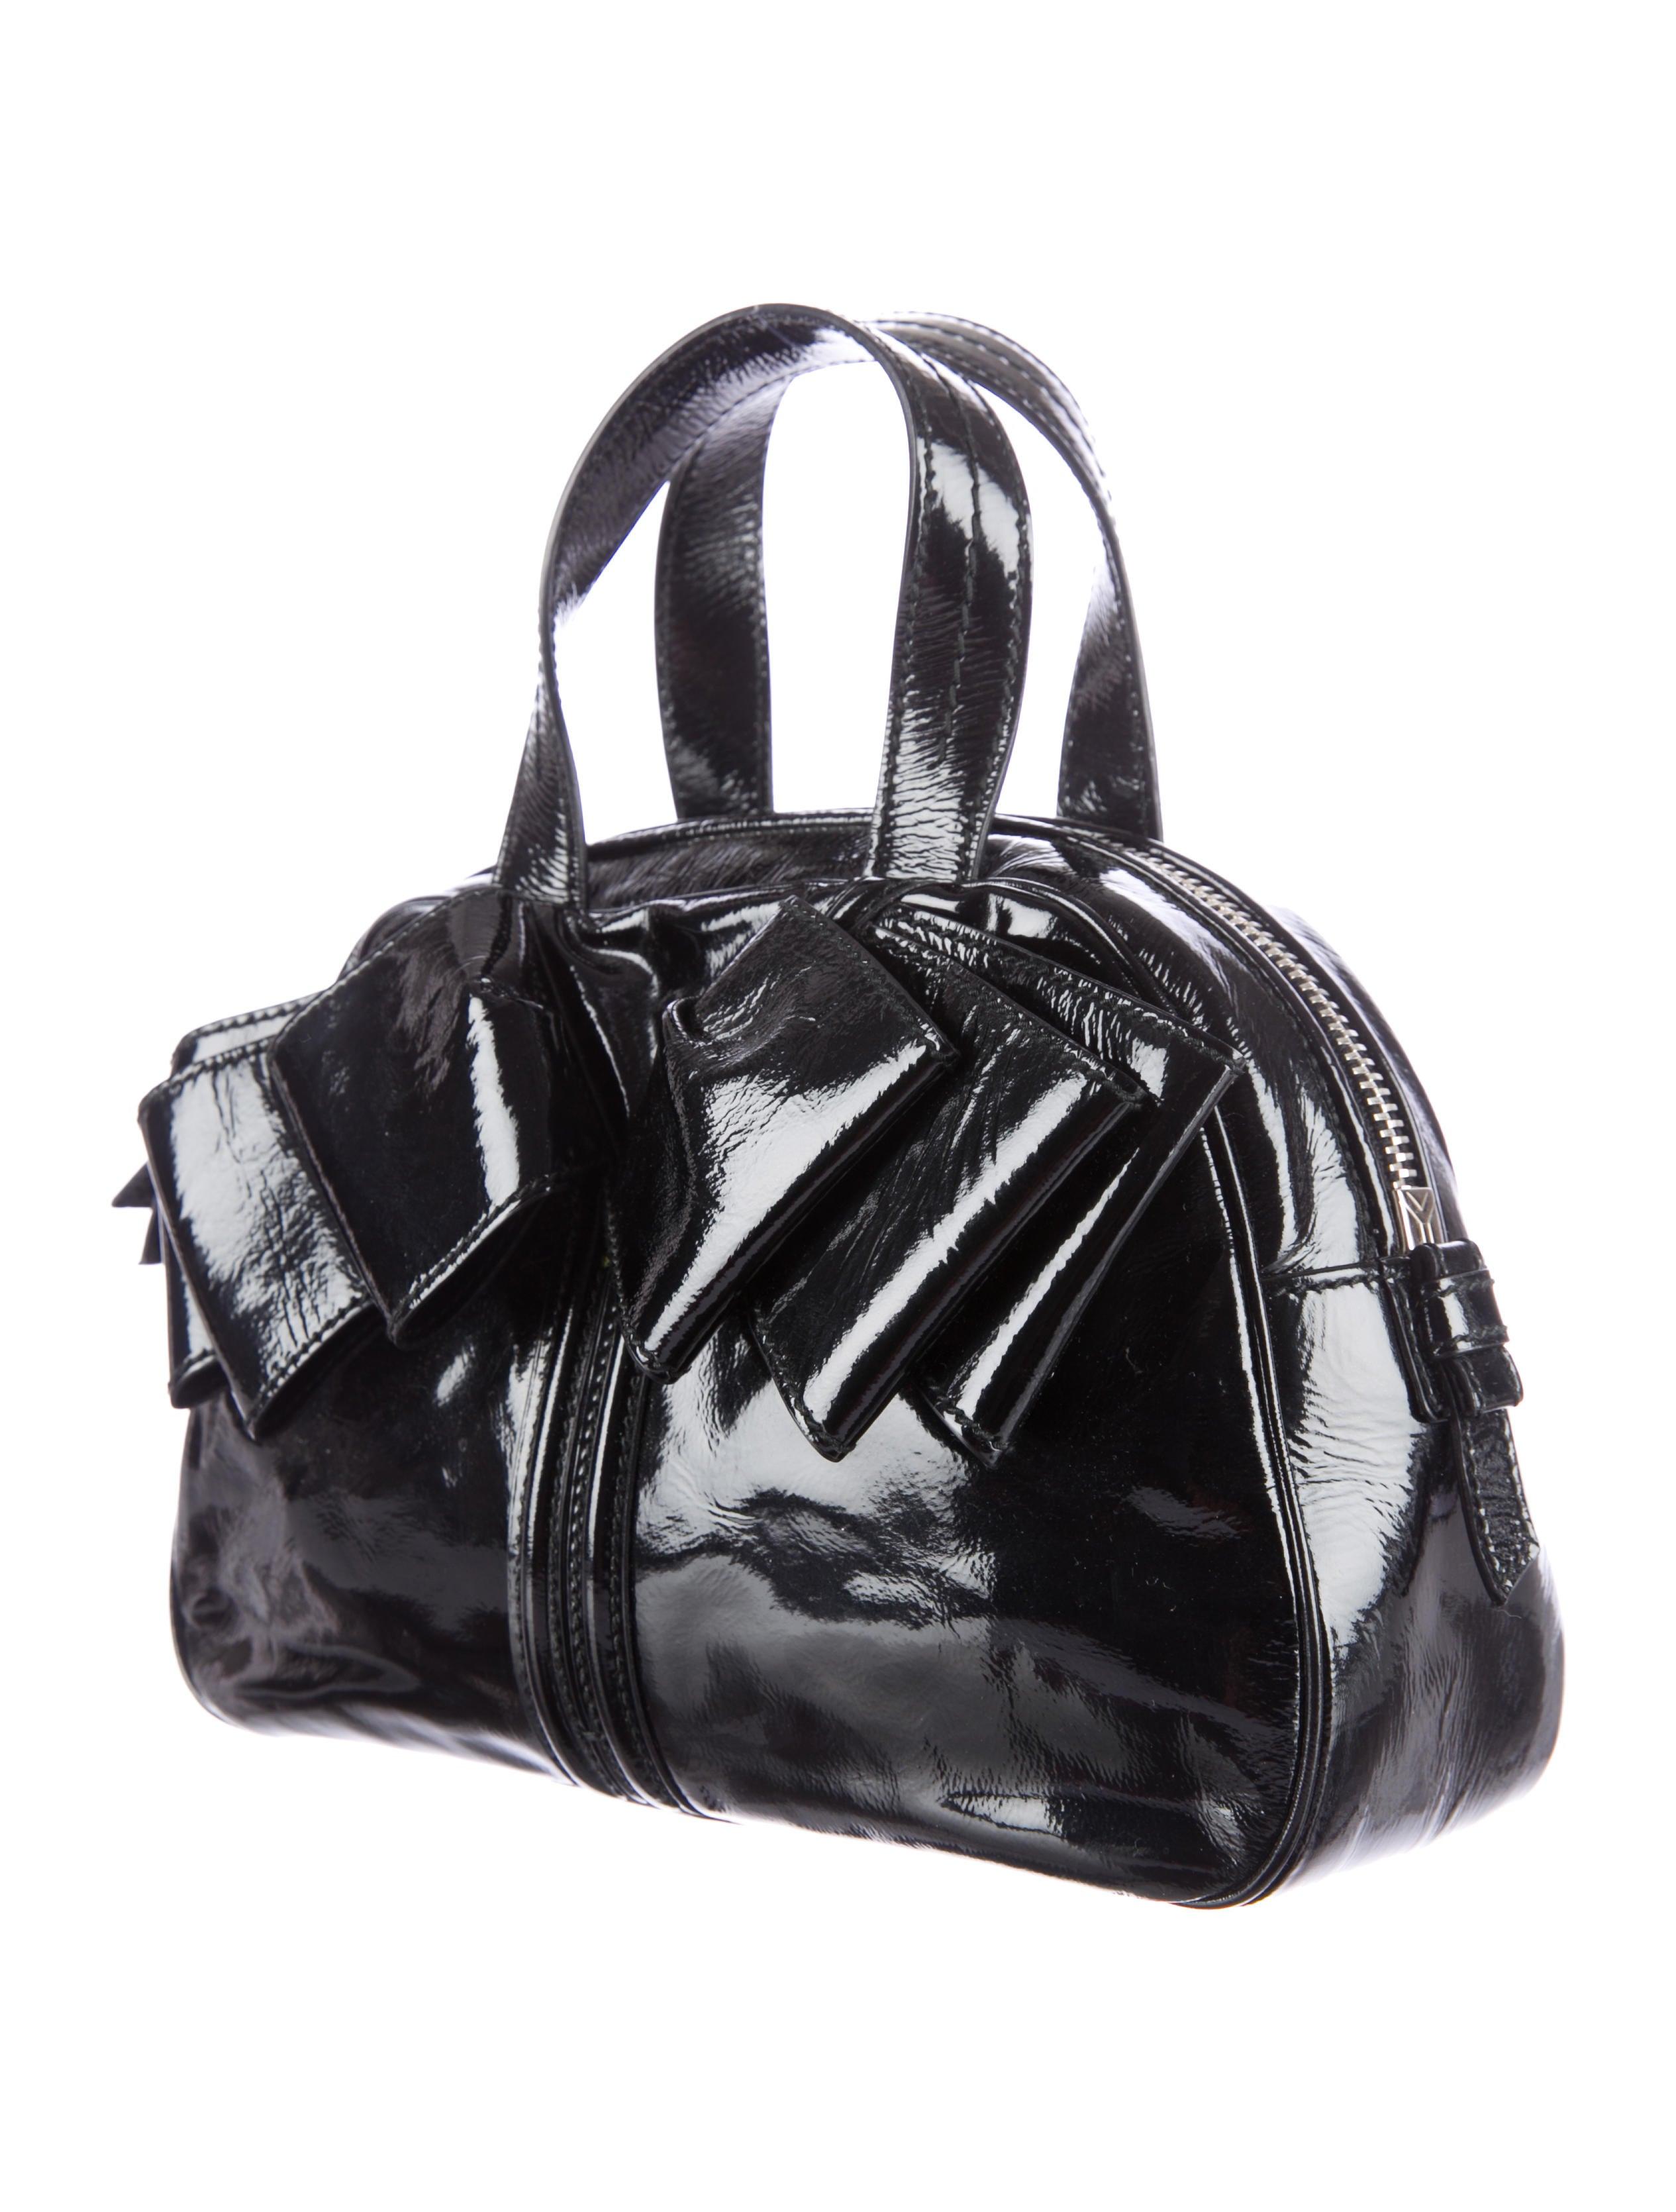 ysl yves saint laurent bag - yves saint laurent obi bow bag, saint laurant bag